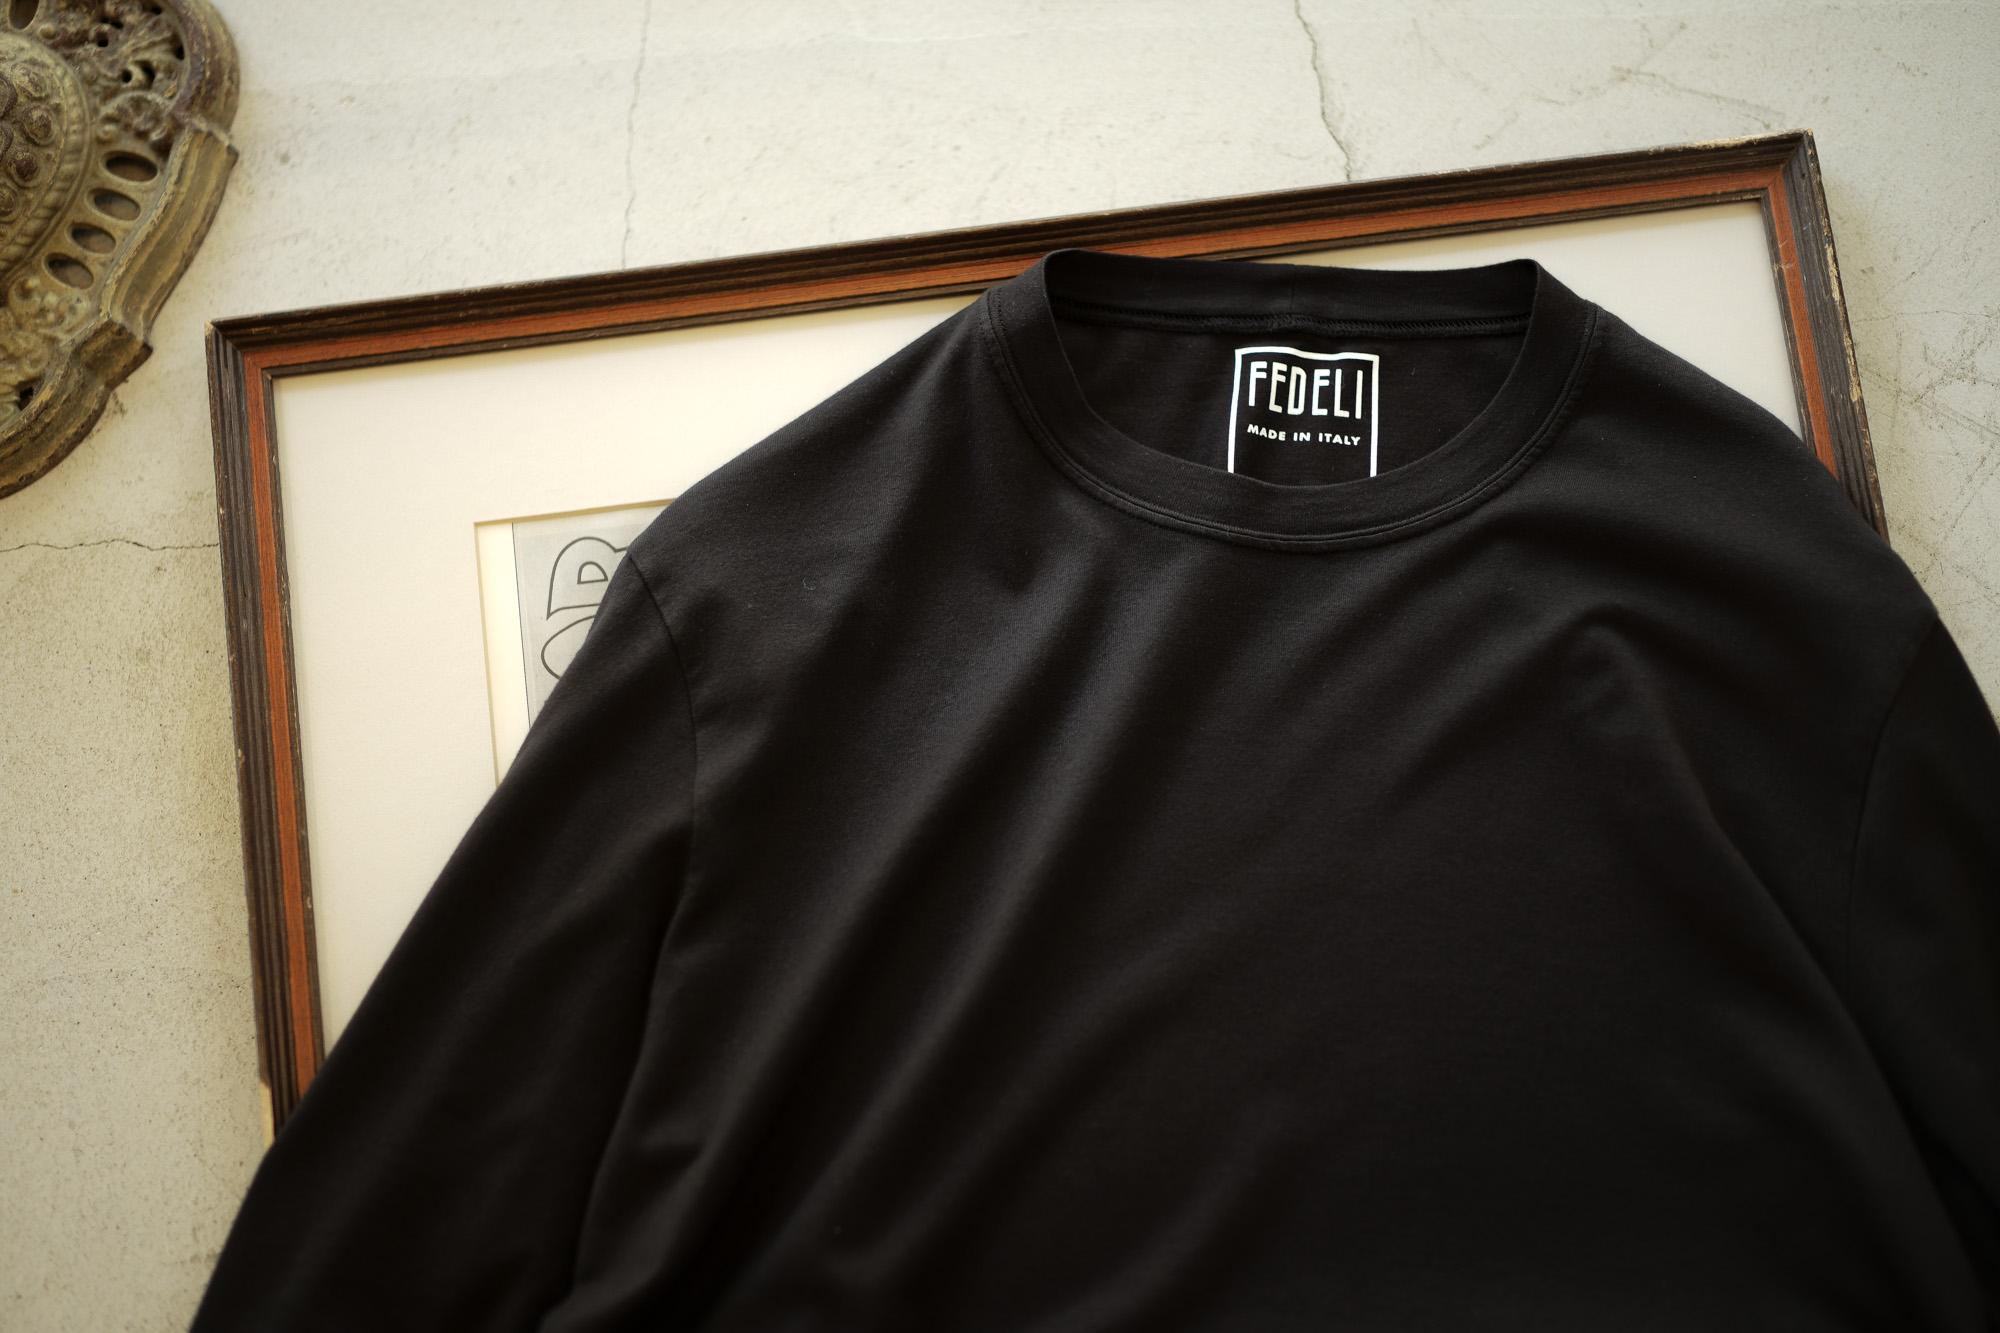 FEDELI (フェデリ) Long Sleeve Crew Neck T-shirt (ロングスリーブ Tシャツ) ギザコットン ロングスリーブ Tシャツ BLACK (ブラック・36) made in italy (イタリア製) 2022 春夏 【ご予約開始】 愛知 名古屋 Alto e Diritto altoediritto アルトエデリット ロンT ロングTシャツ